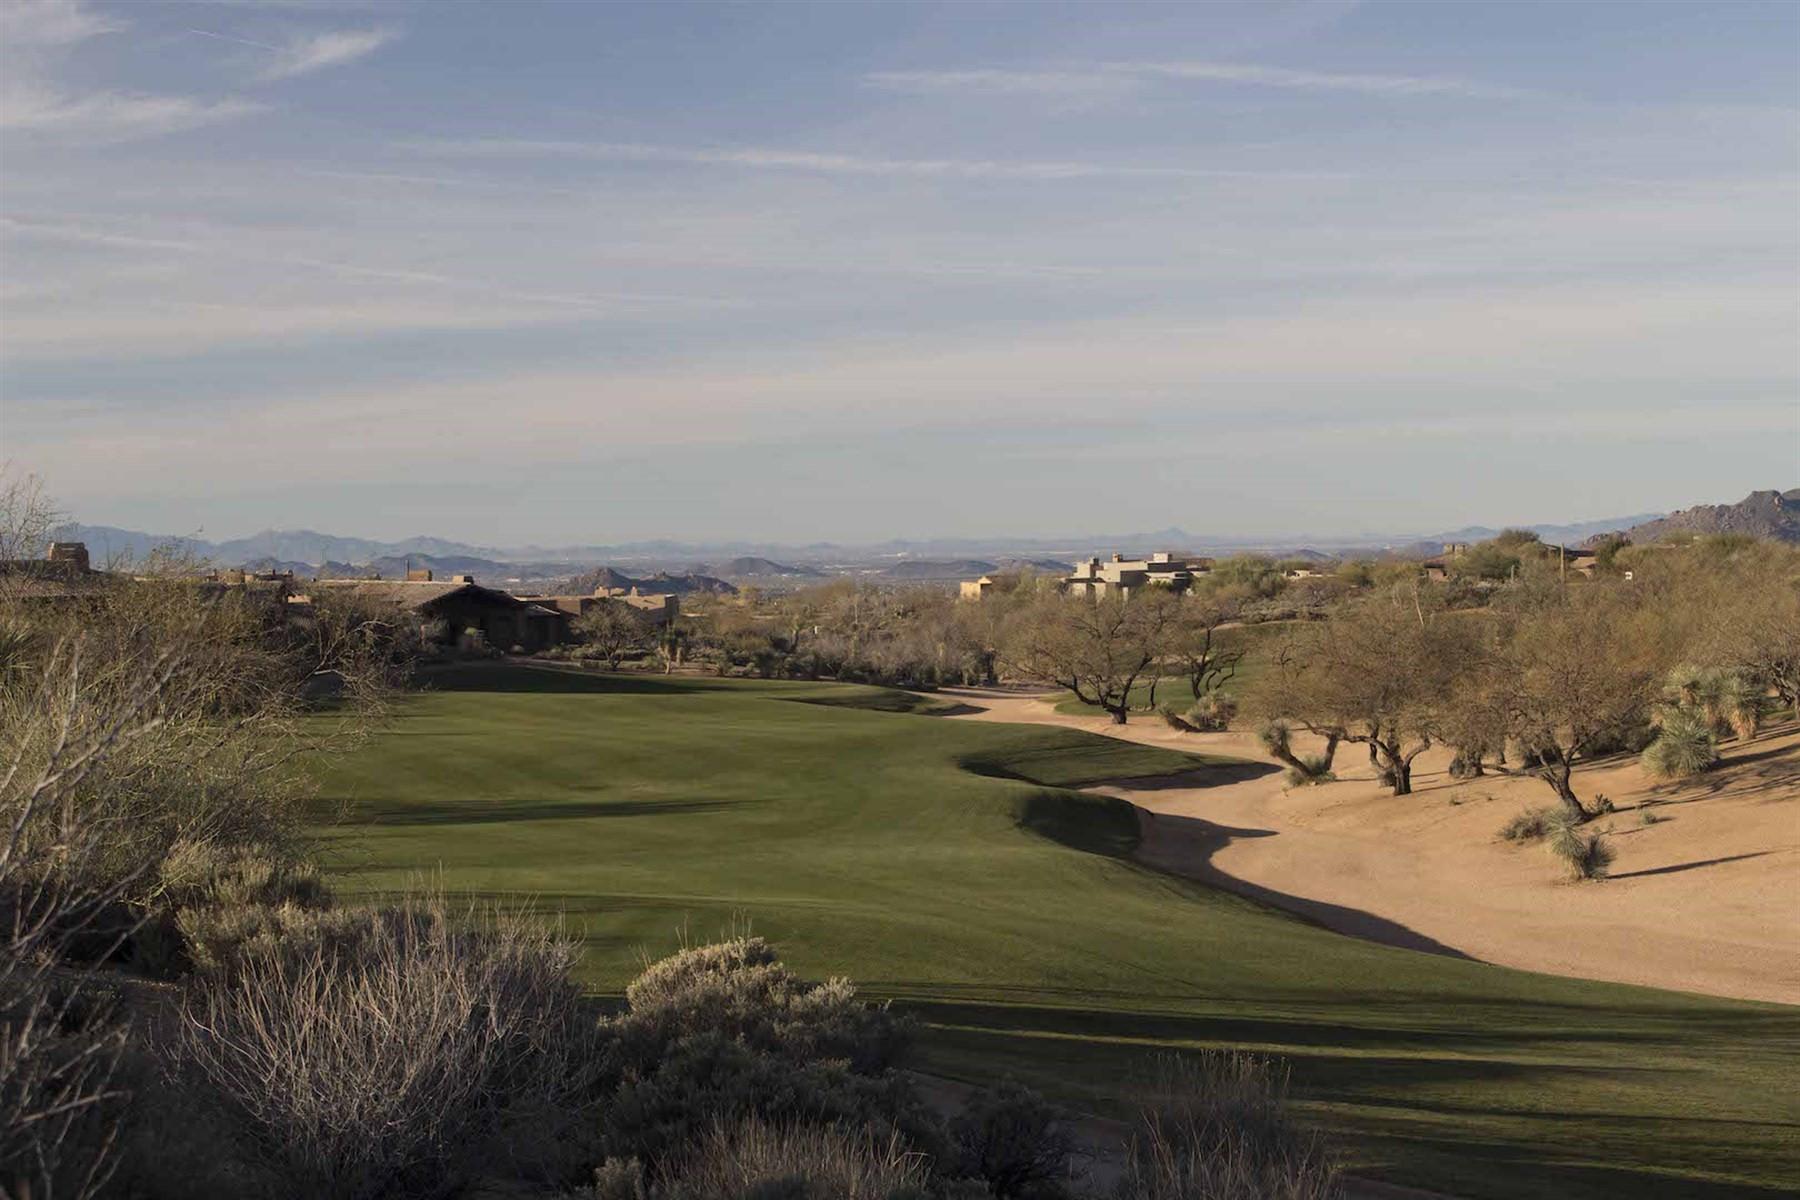 Terreno por un Venta en Elevated double fairway golf course homesite 11360 E Apache Vistas Dr #40 Scottsdale, Arizona, 85262 Estados Unidos